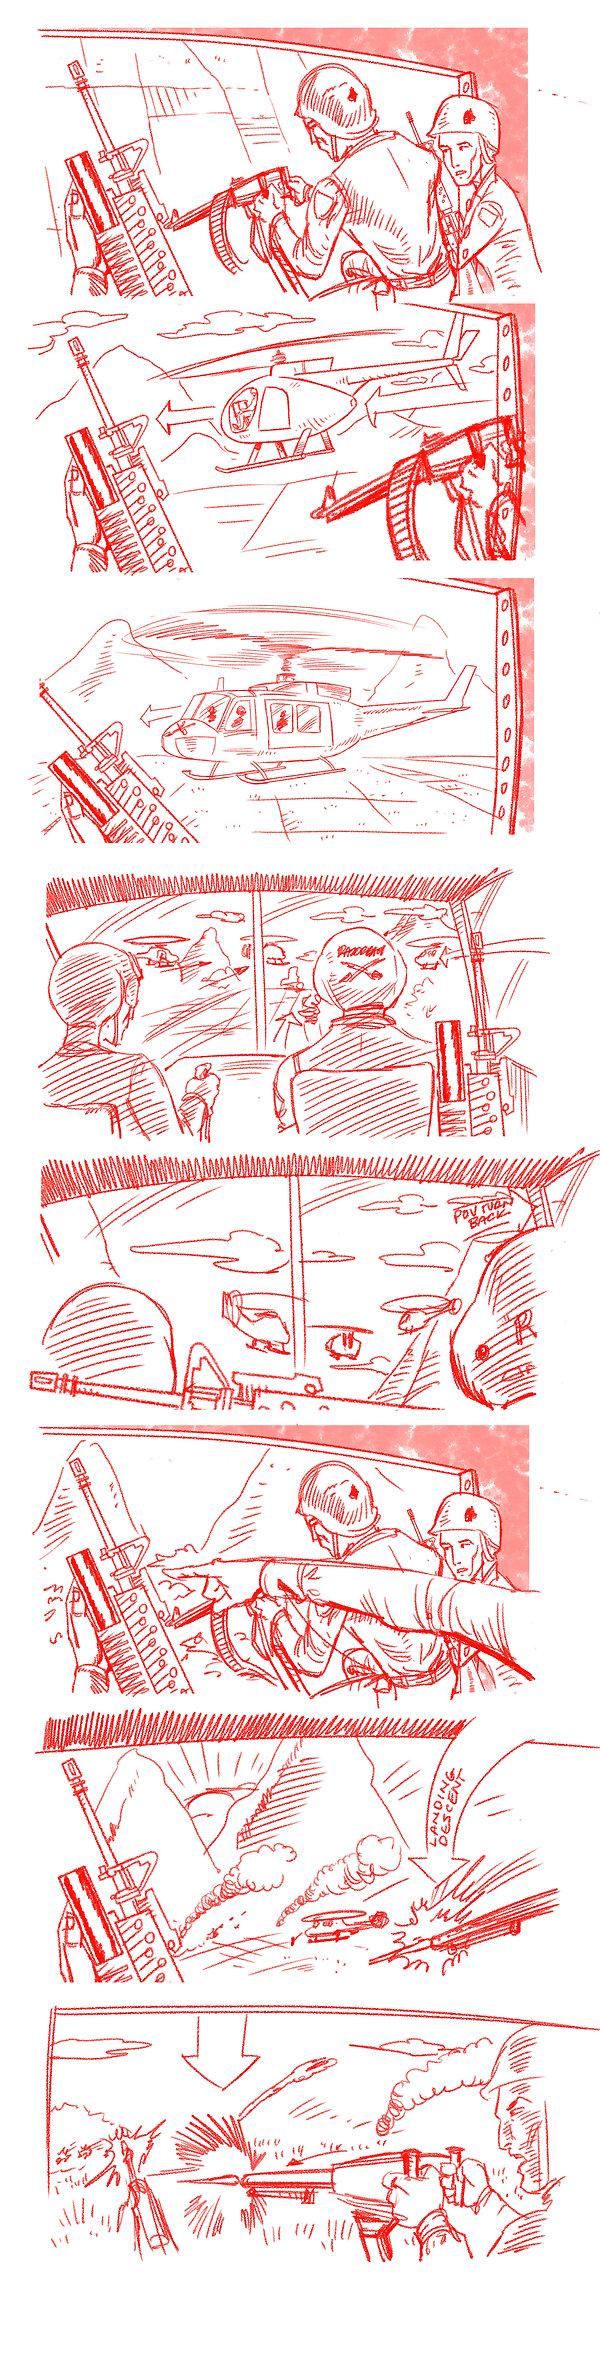 Vietnam_Storyboards.jpg